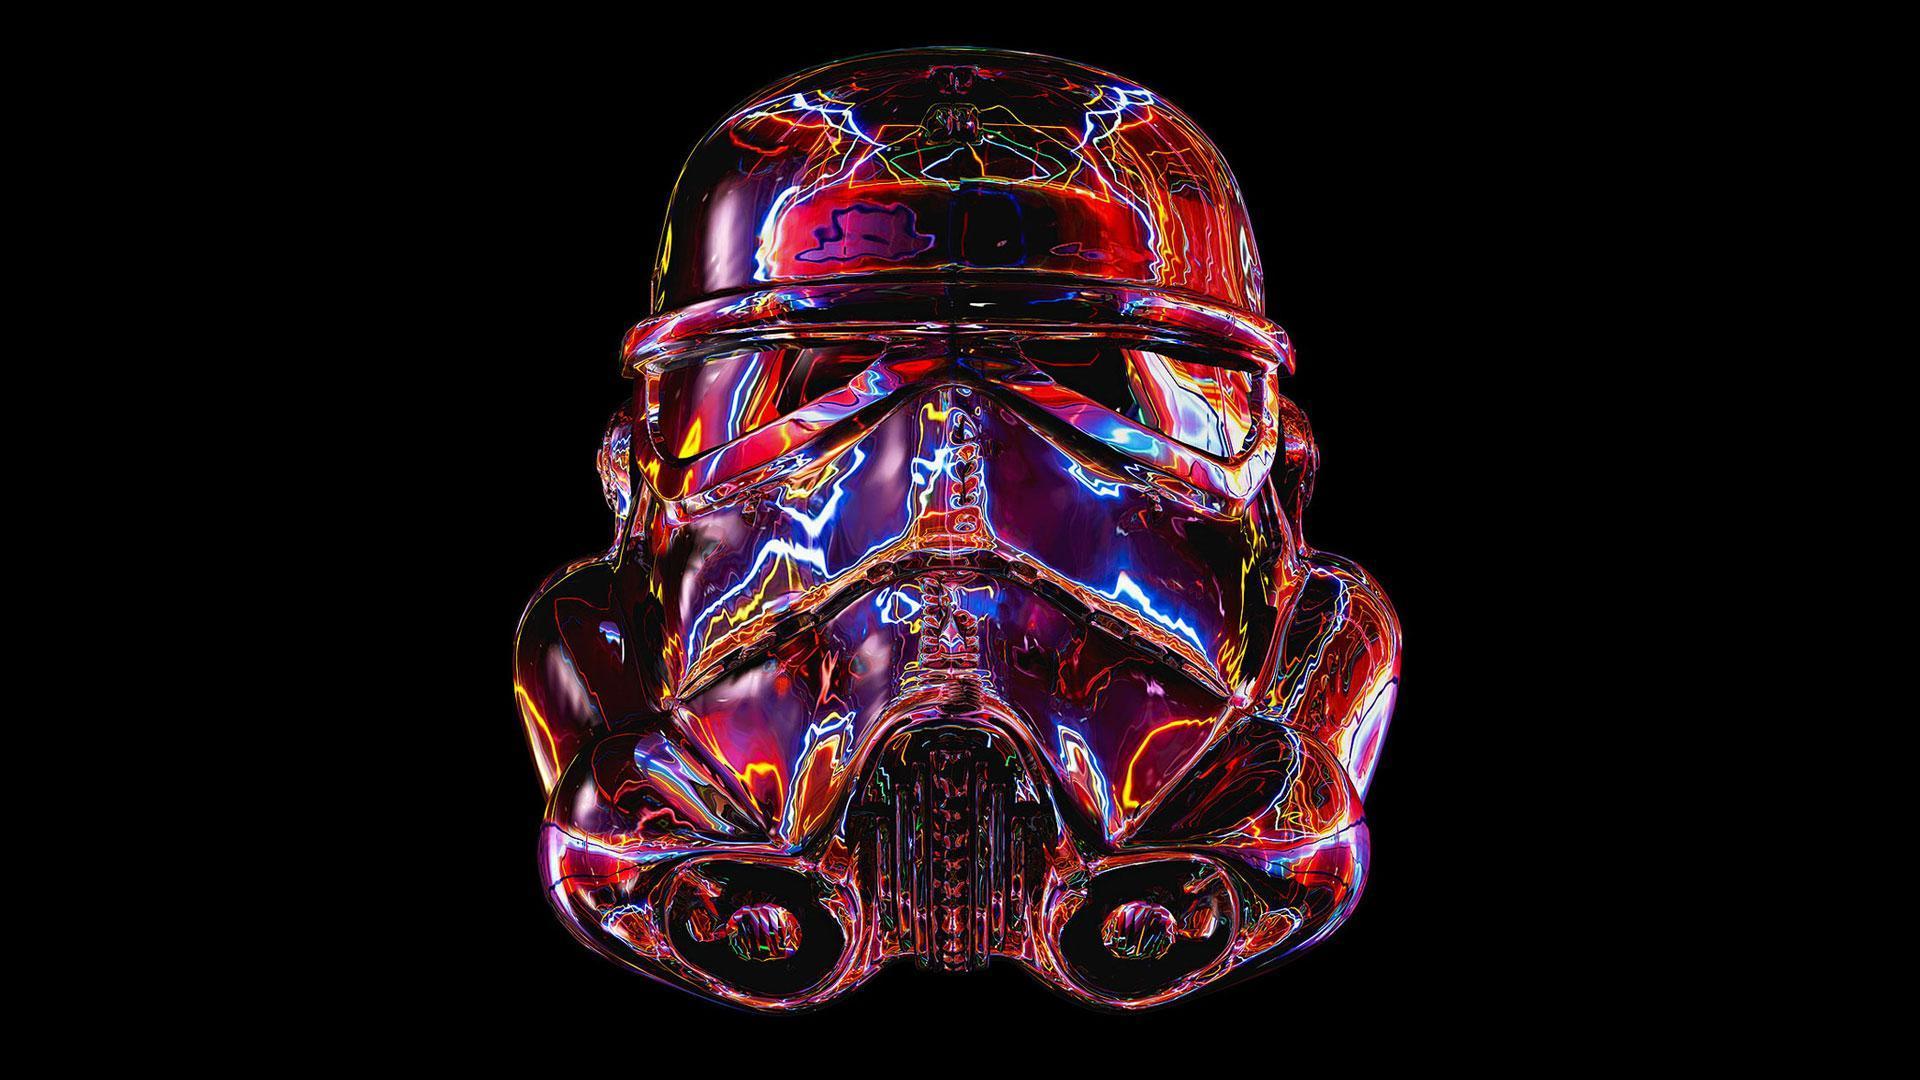 3440x1440 Wallpaper Star Wars: Stormtrooper Wallpapers